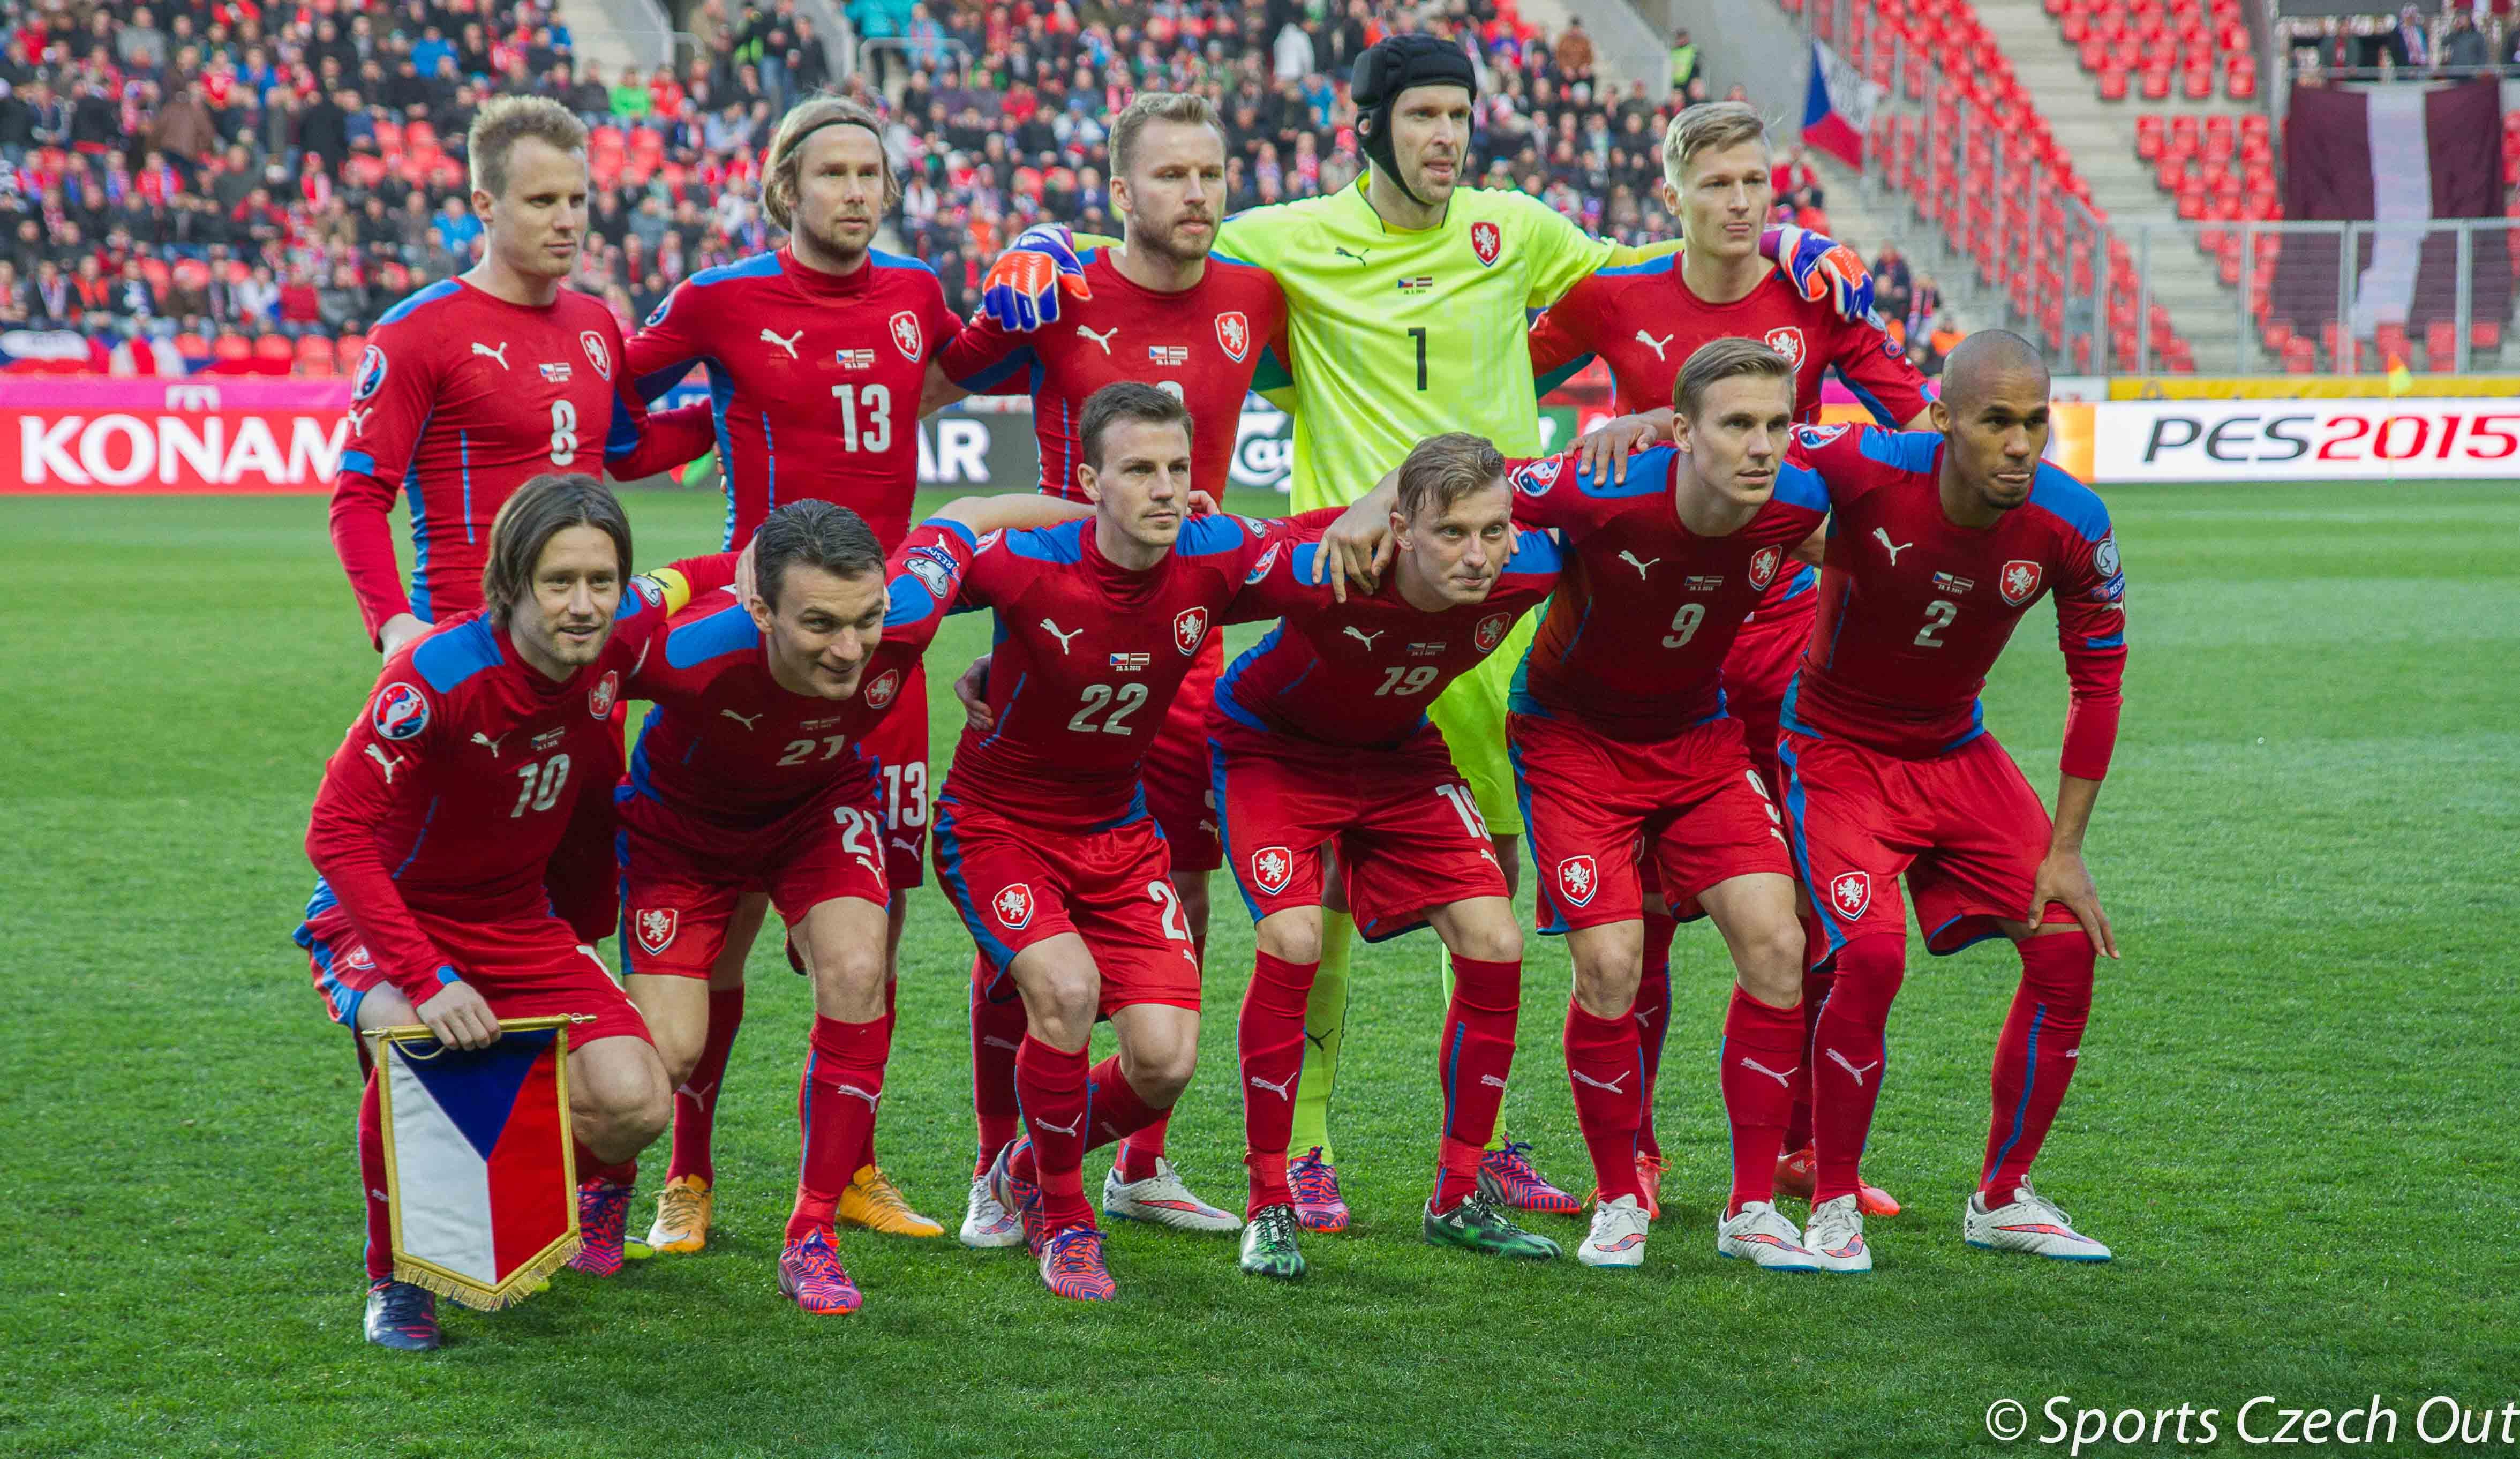 PETR CECH MEMIMPIN SQUAD REPUBLIK CEKO EURO 2016